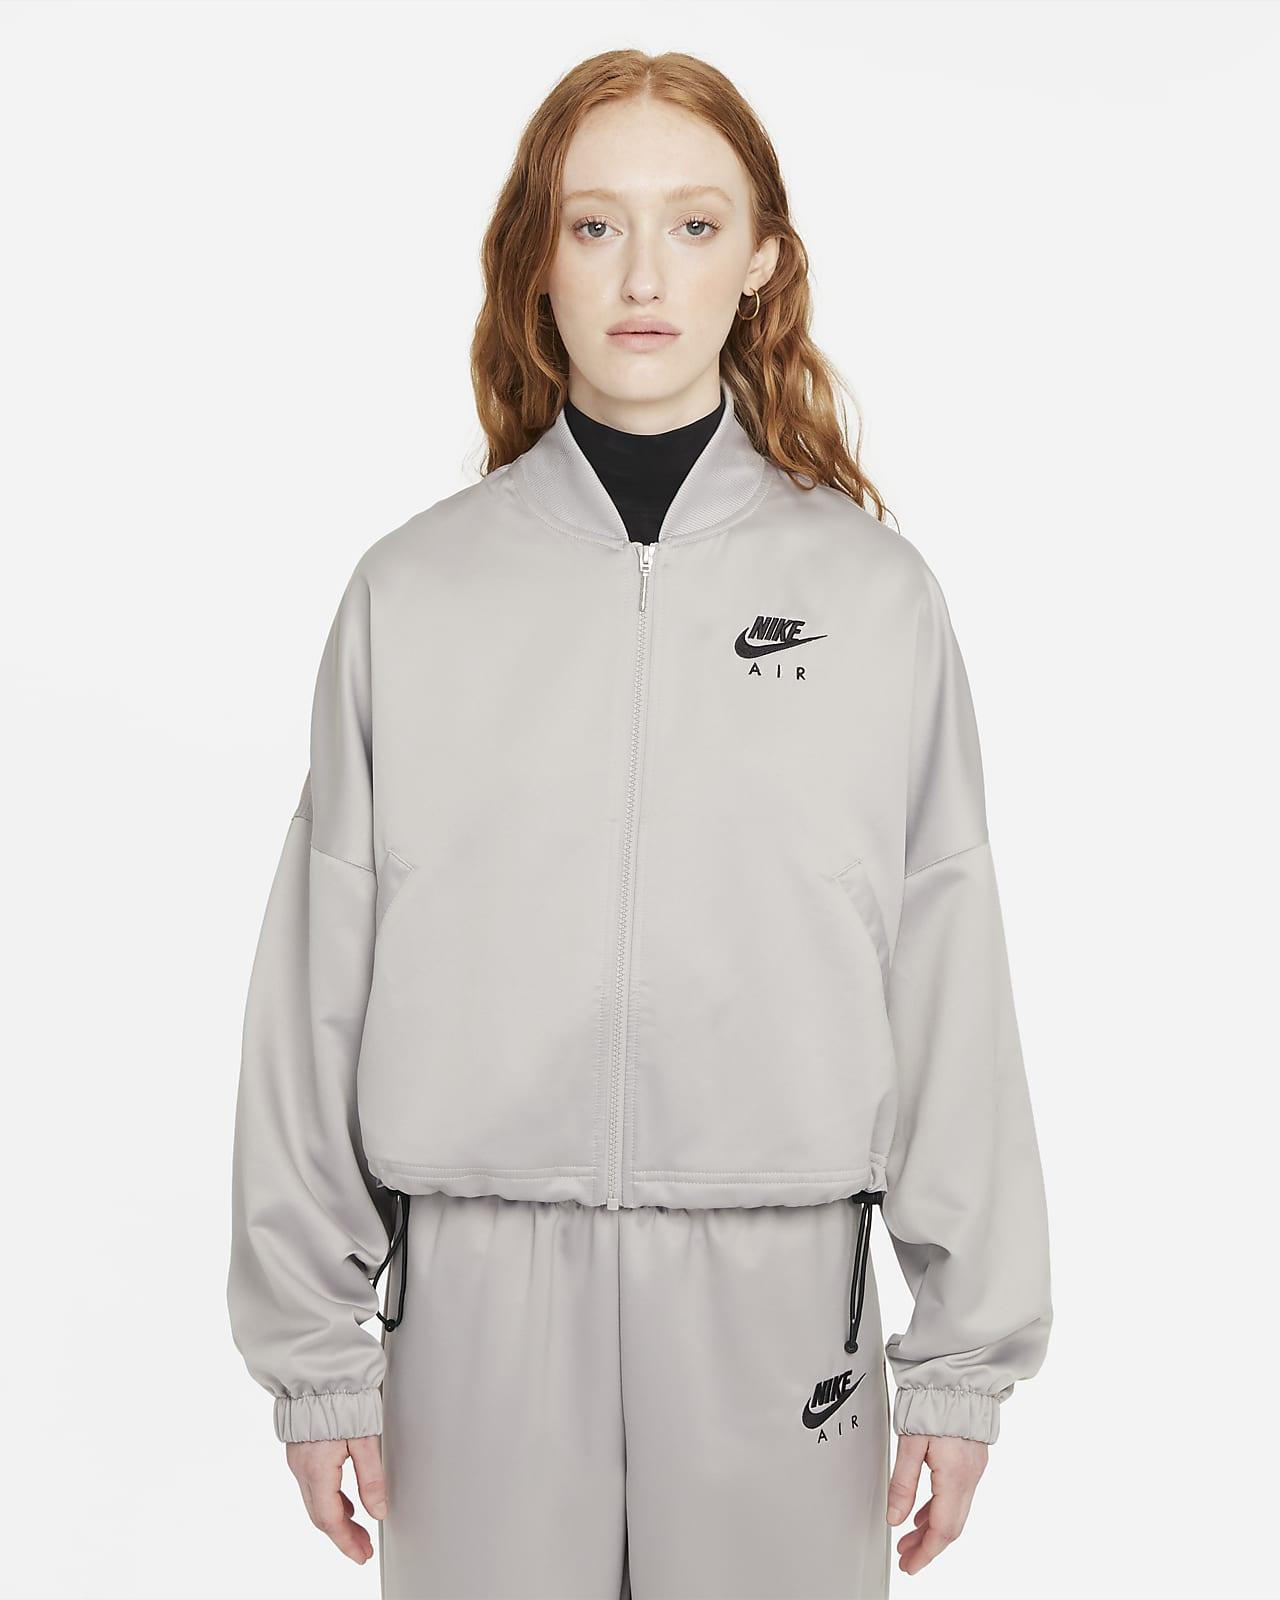 Nike Air Women's Jacket